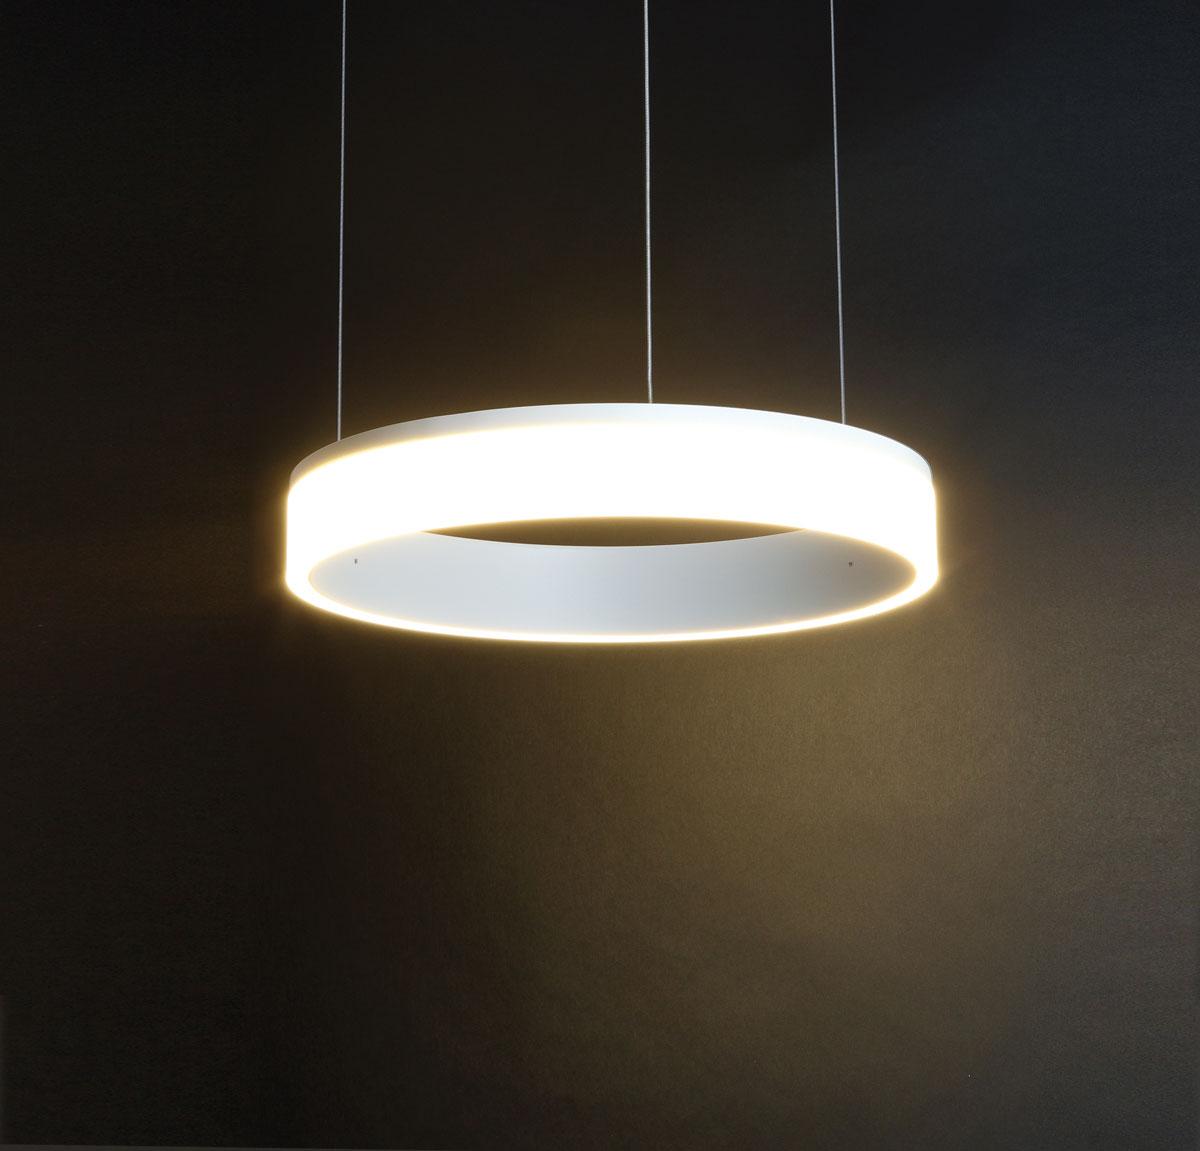 Závěsné svítidlo Maxlight Orbit S, P0052